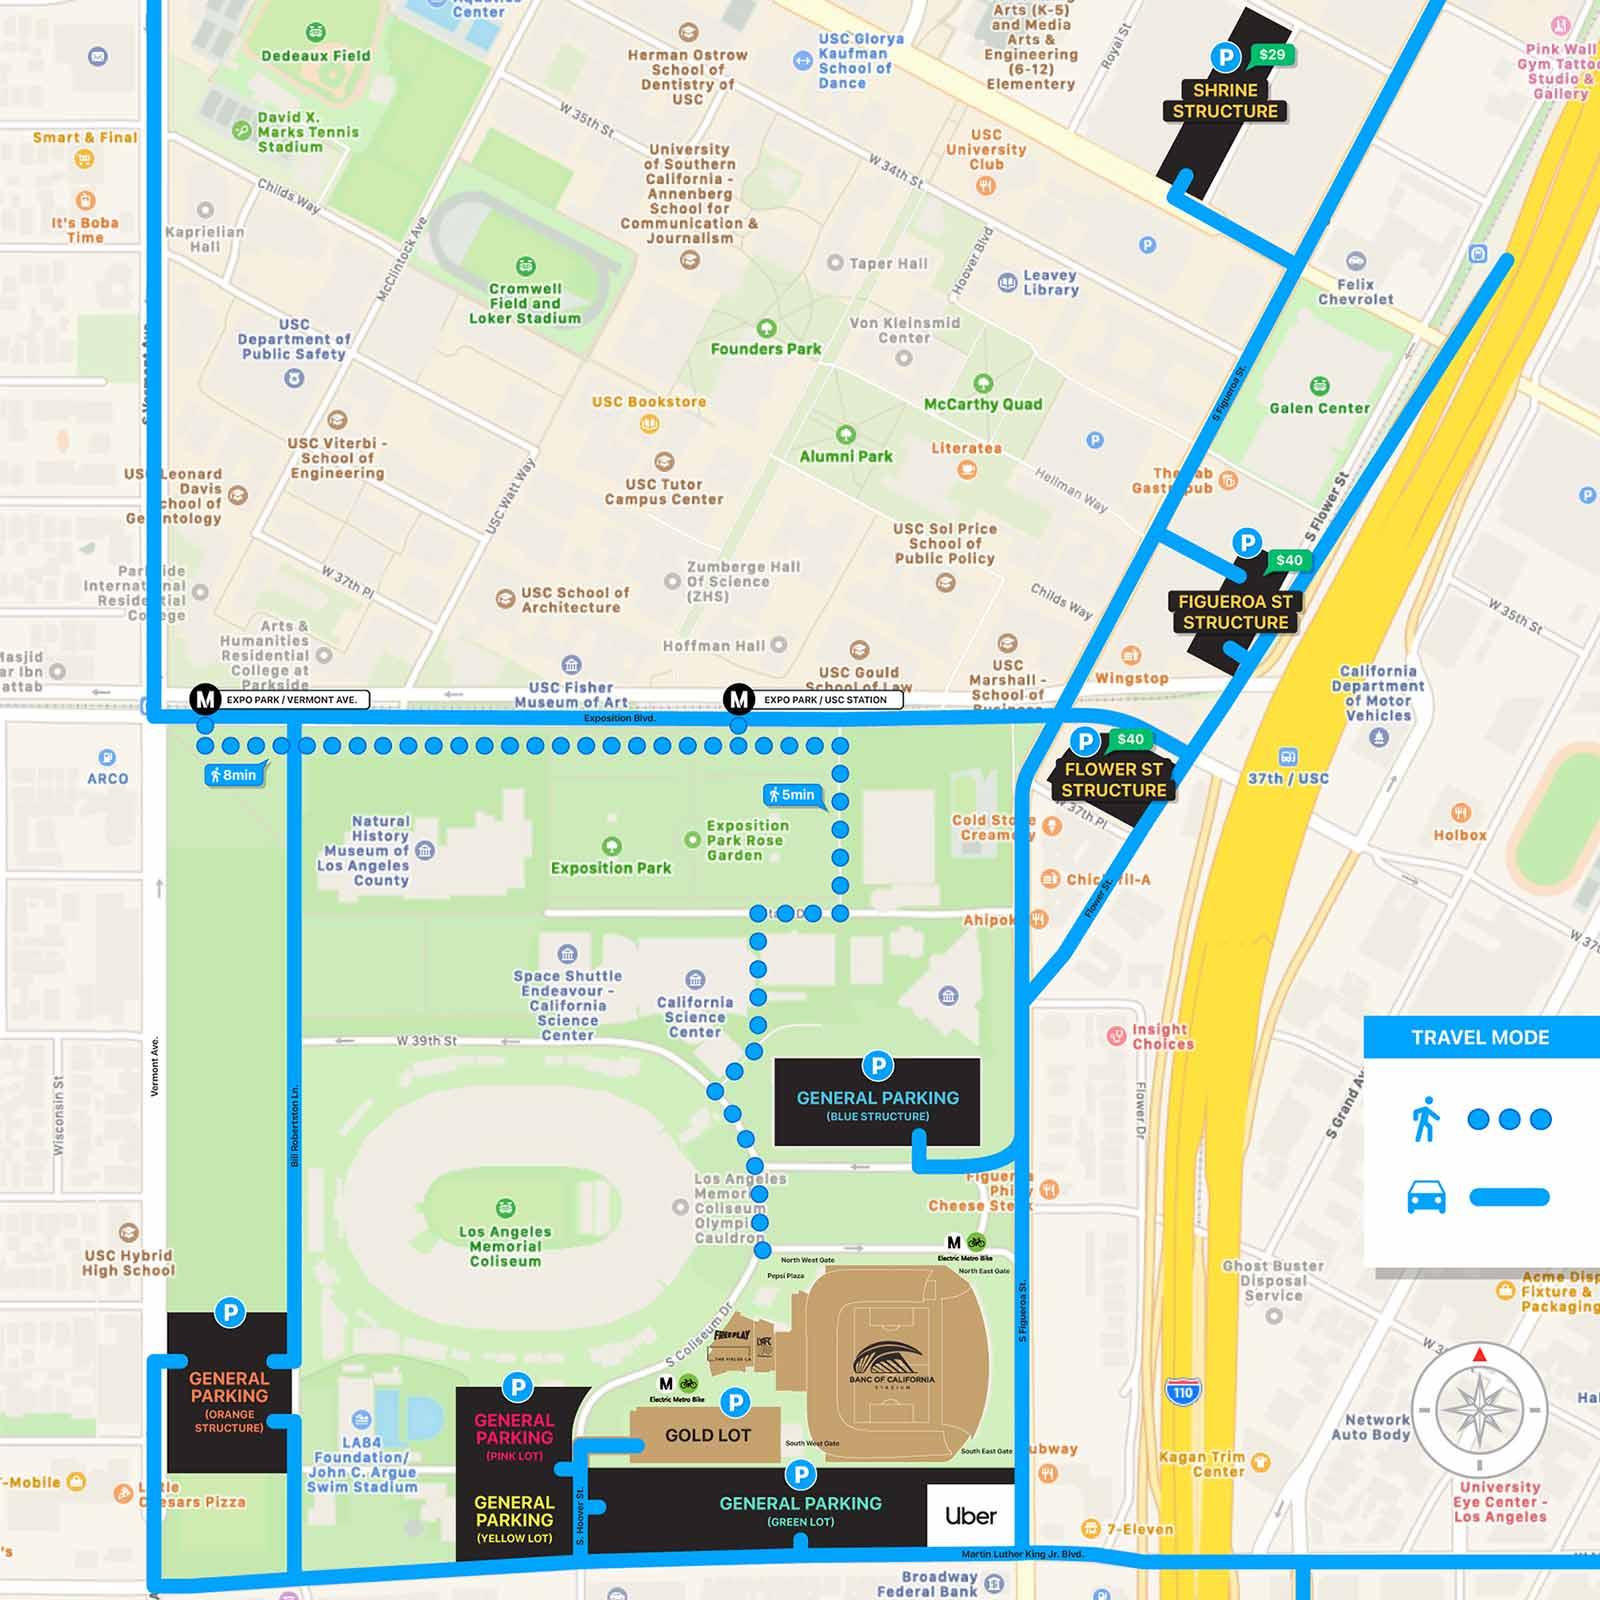 Expo Park Parking Map